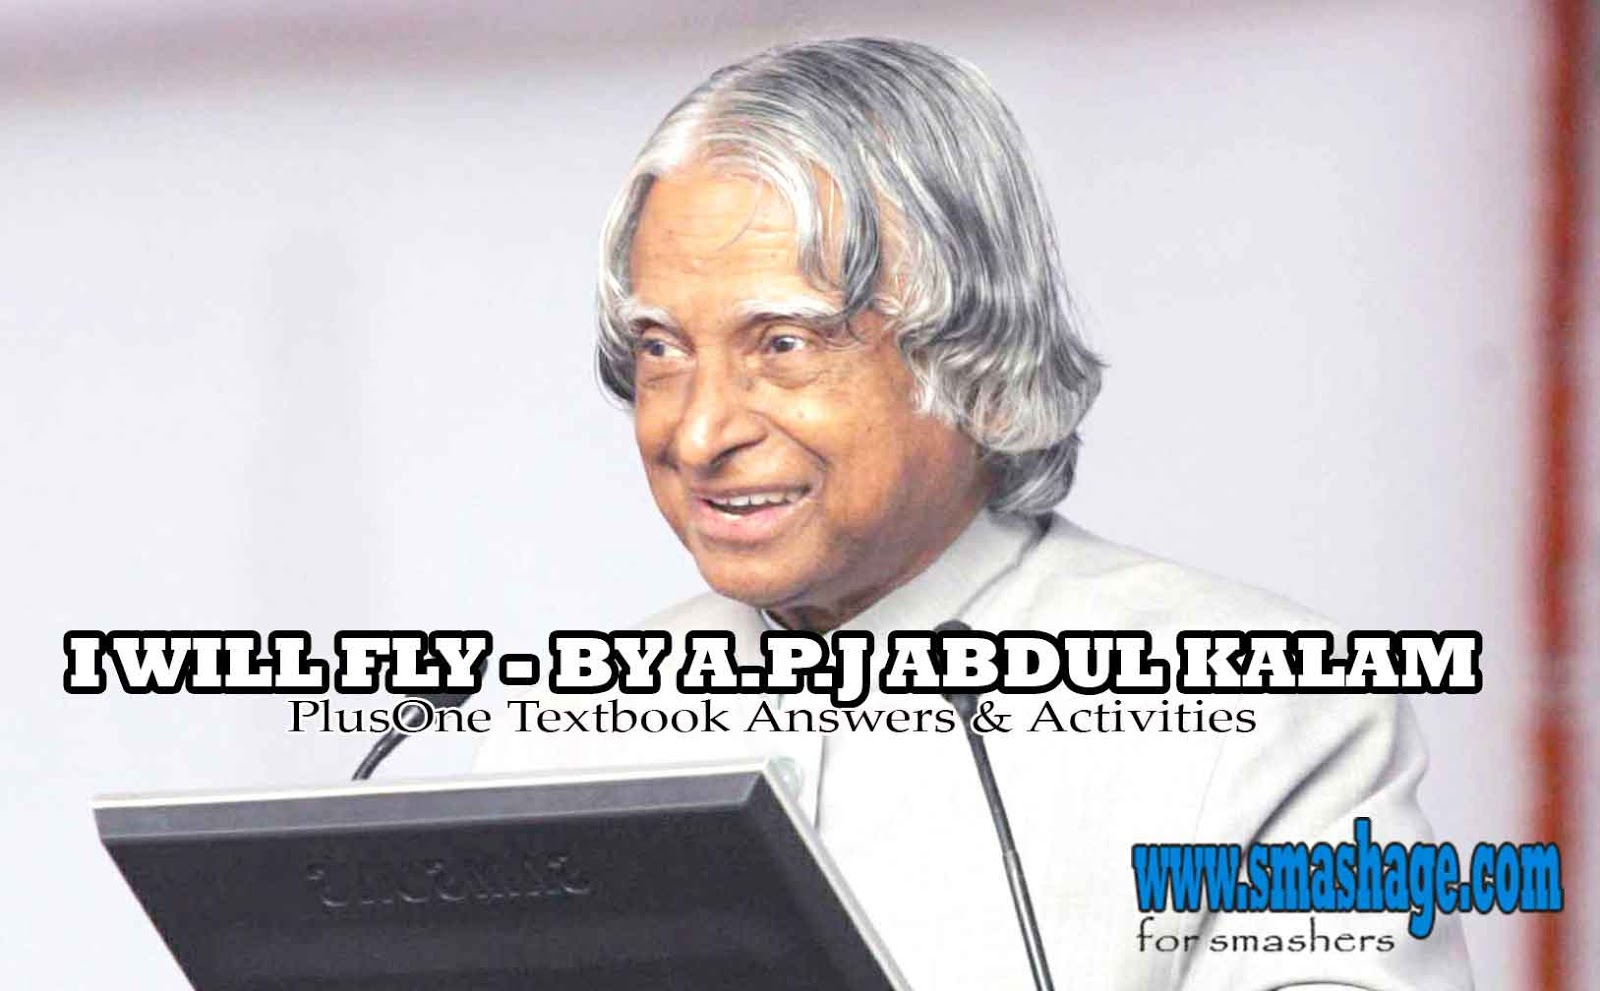 essay on a.p.j.abdul kalam as a role model